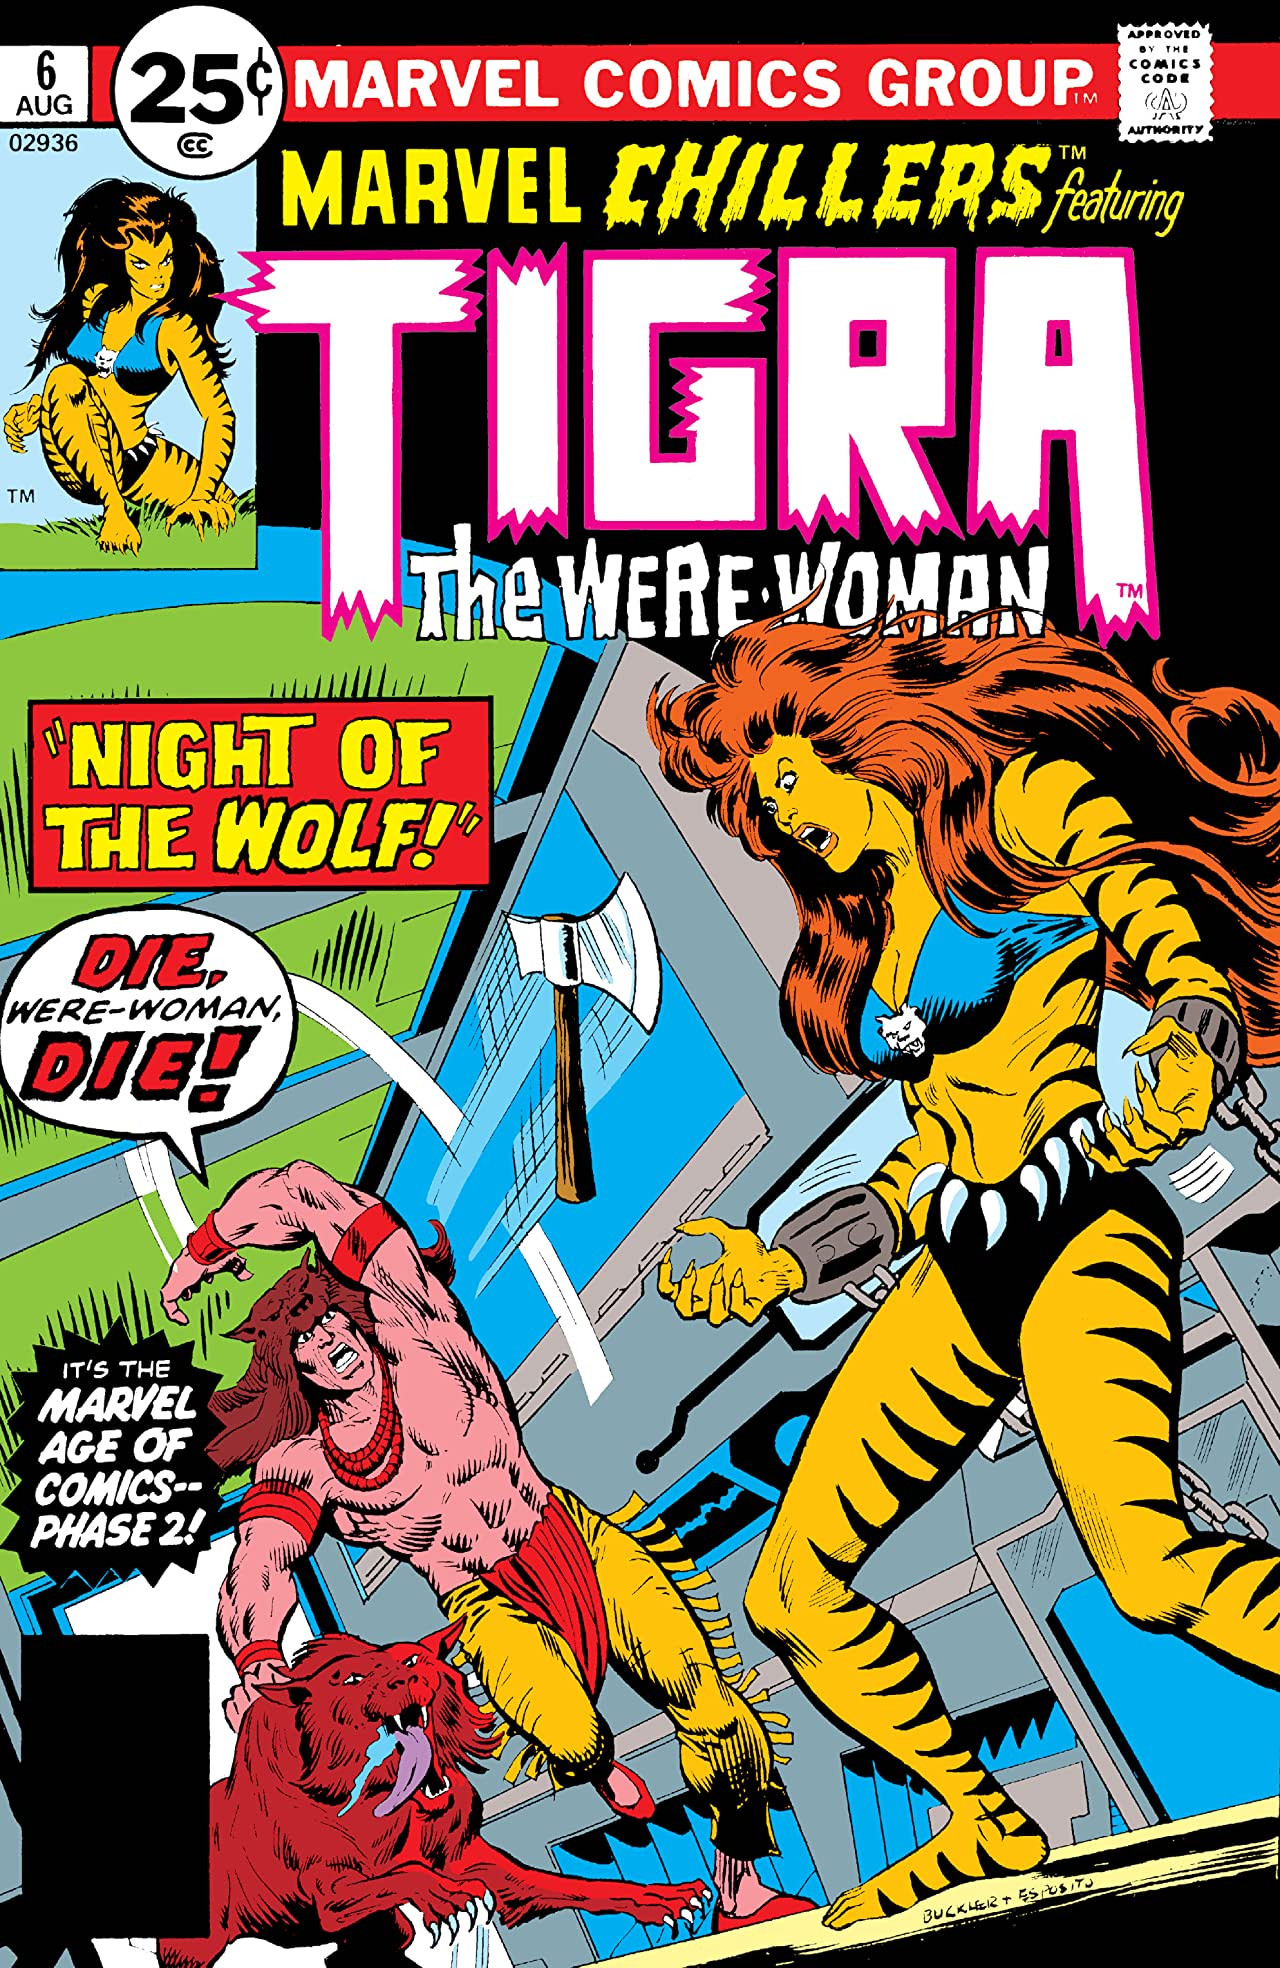 Marvel Chillers Vol 1 6